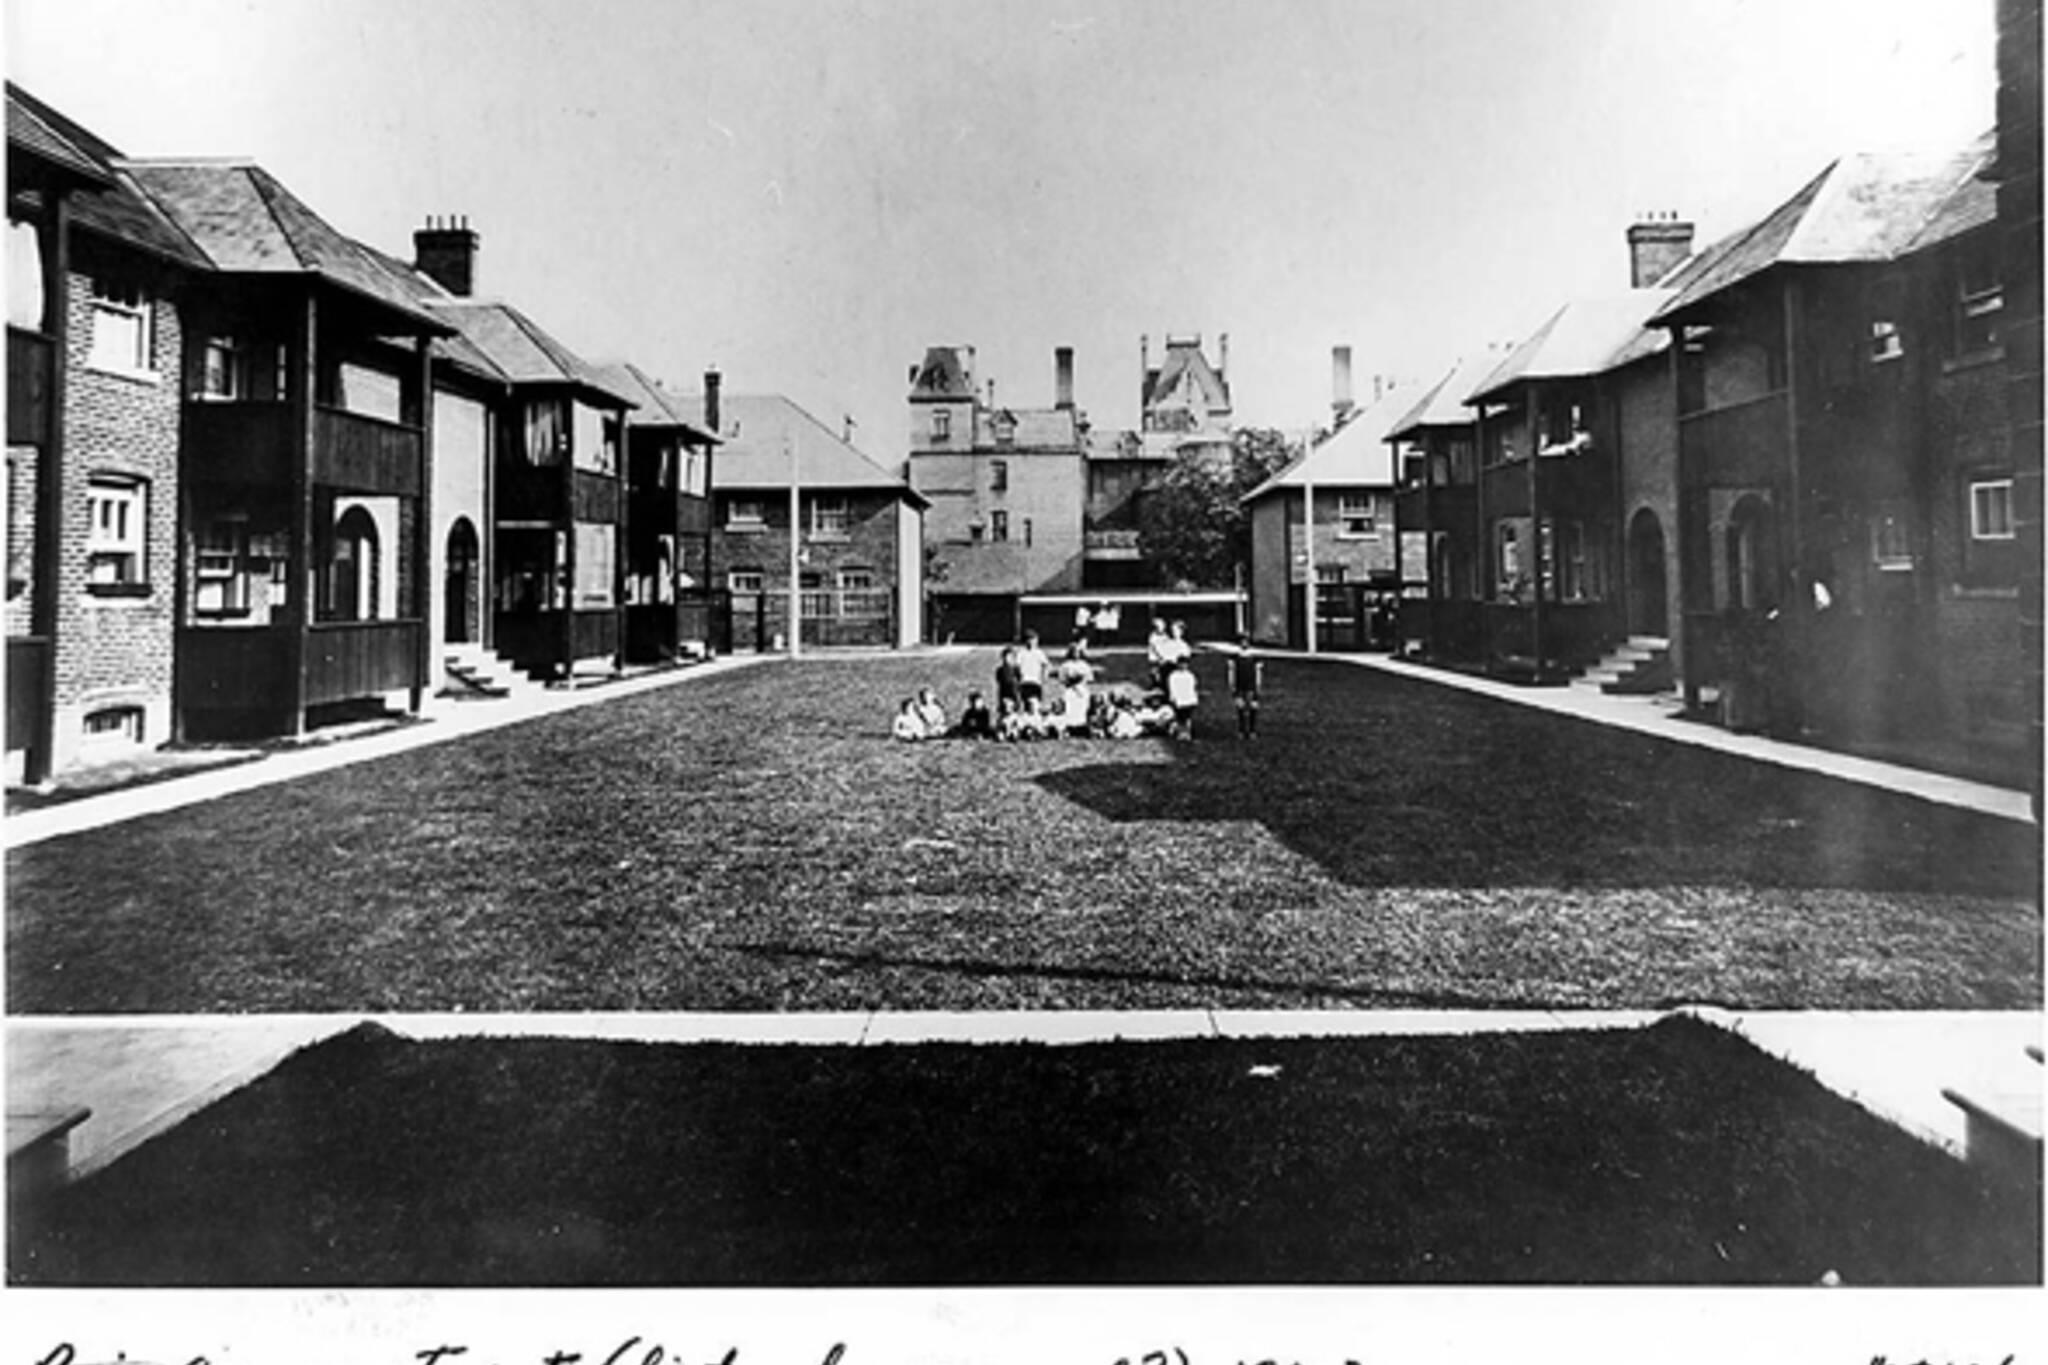 Toronto, social housing, housing reform, public health, Dr. Charles Hastings, 1913